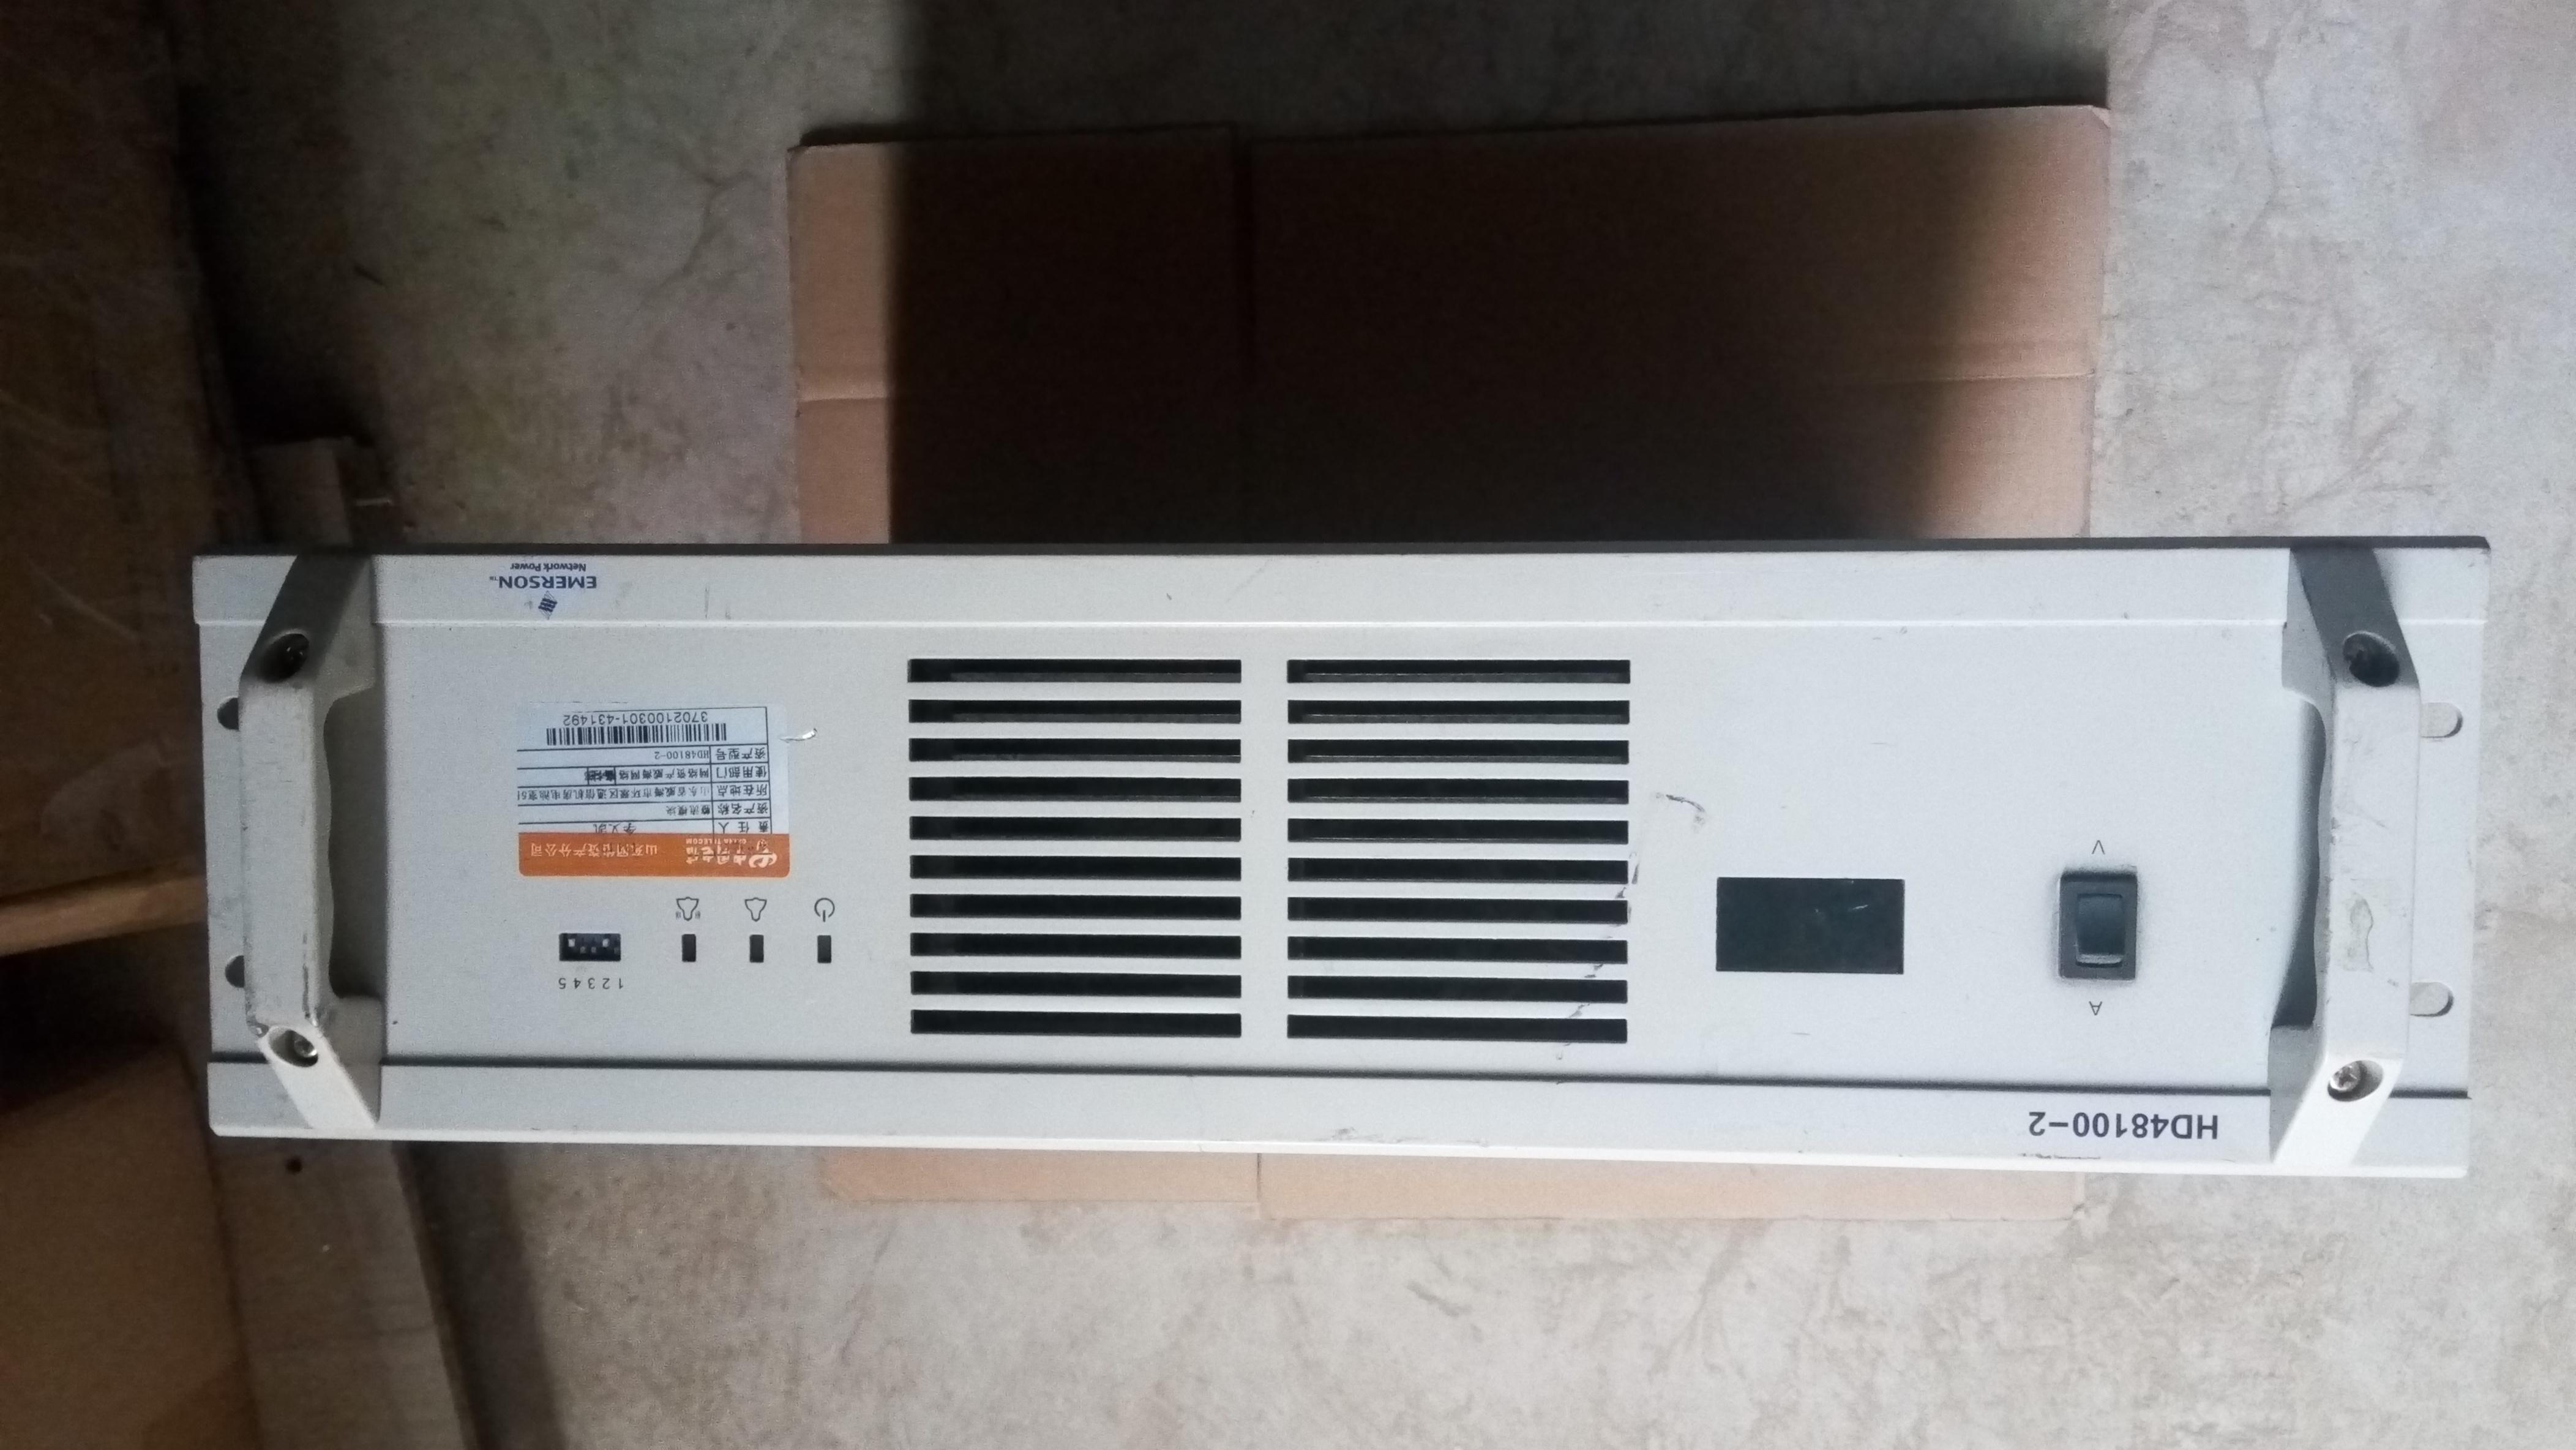 The new Emerson Compaq HD48100-2 power module